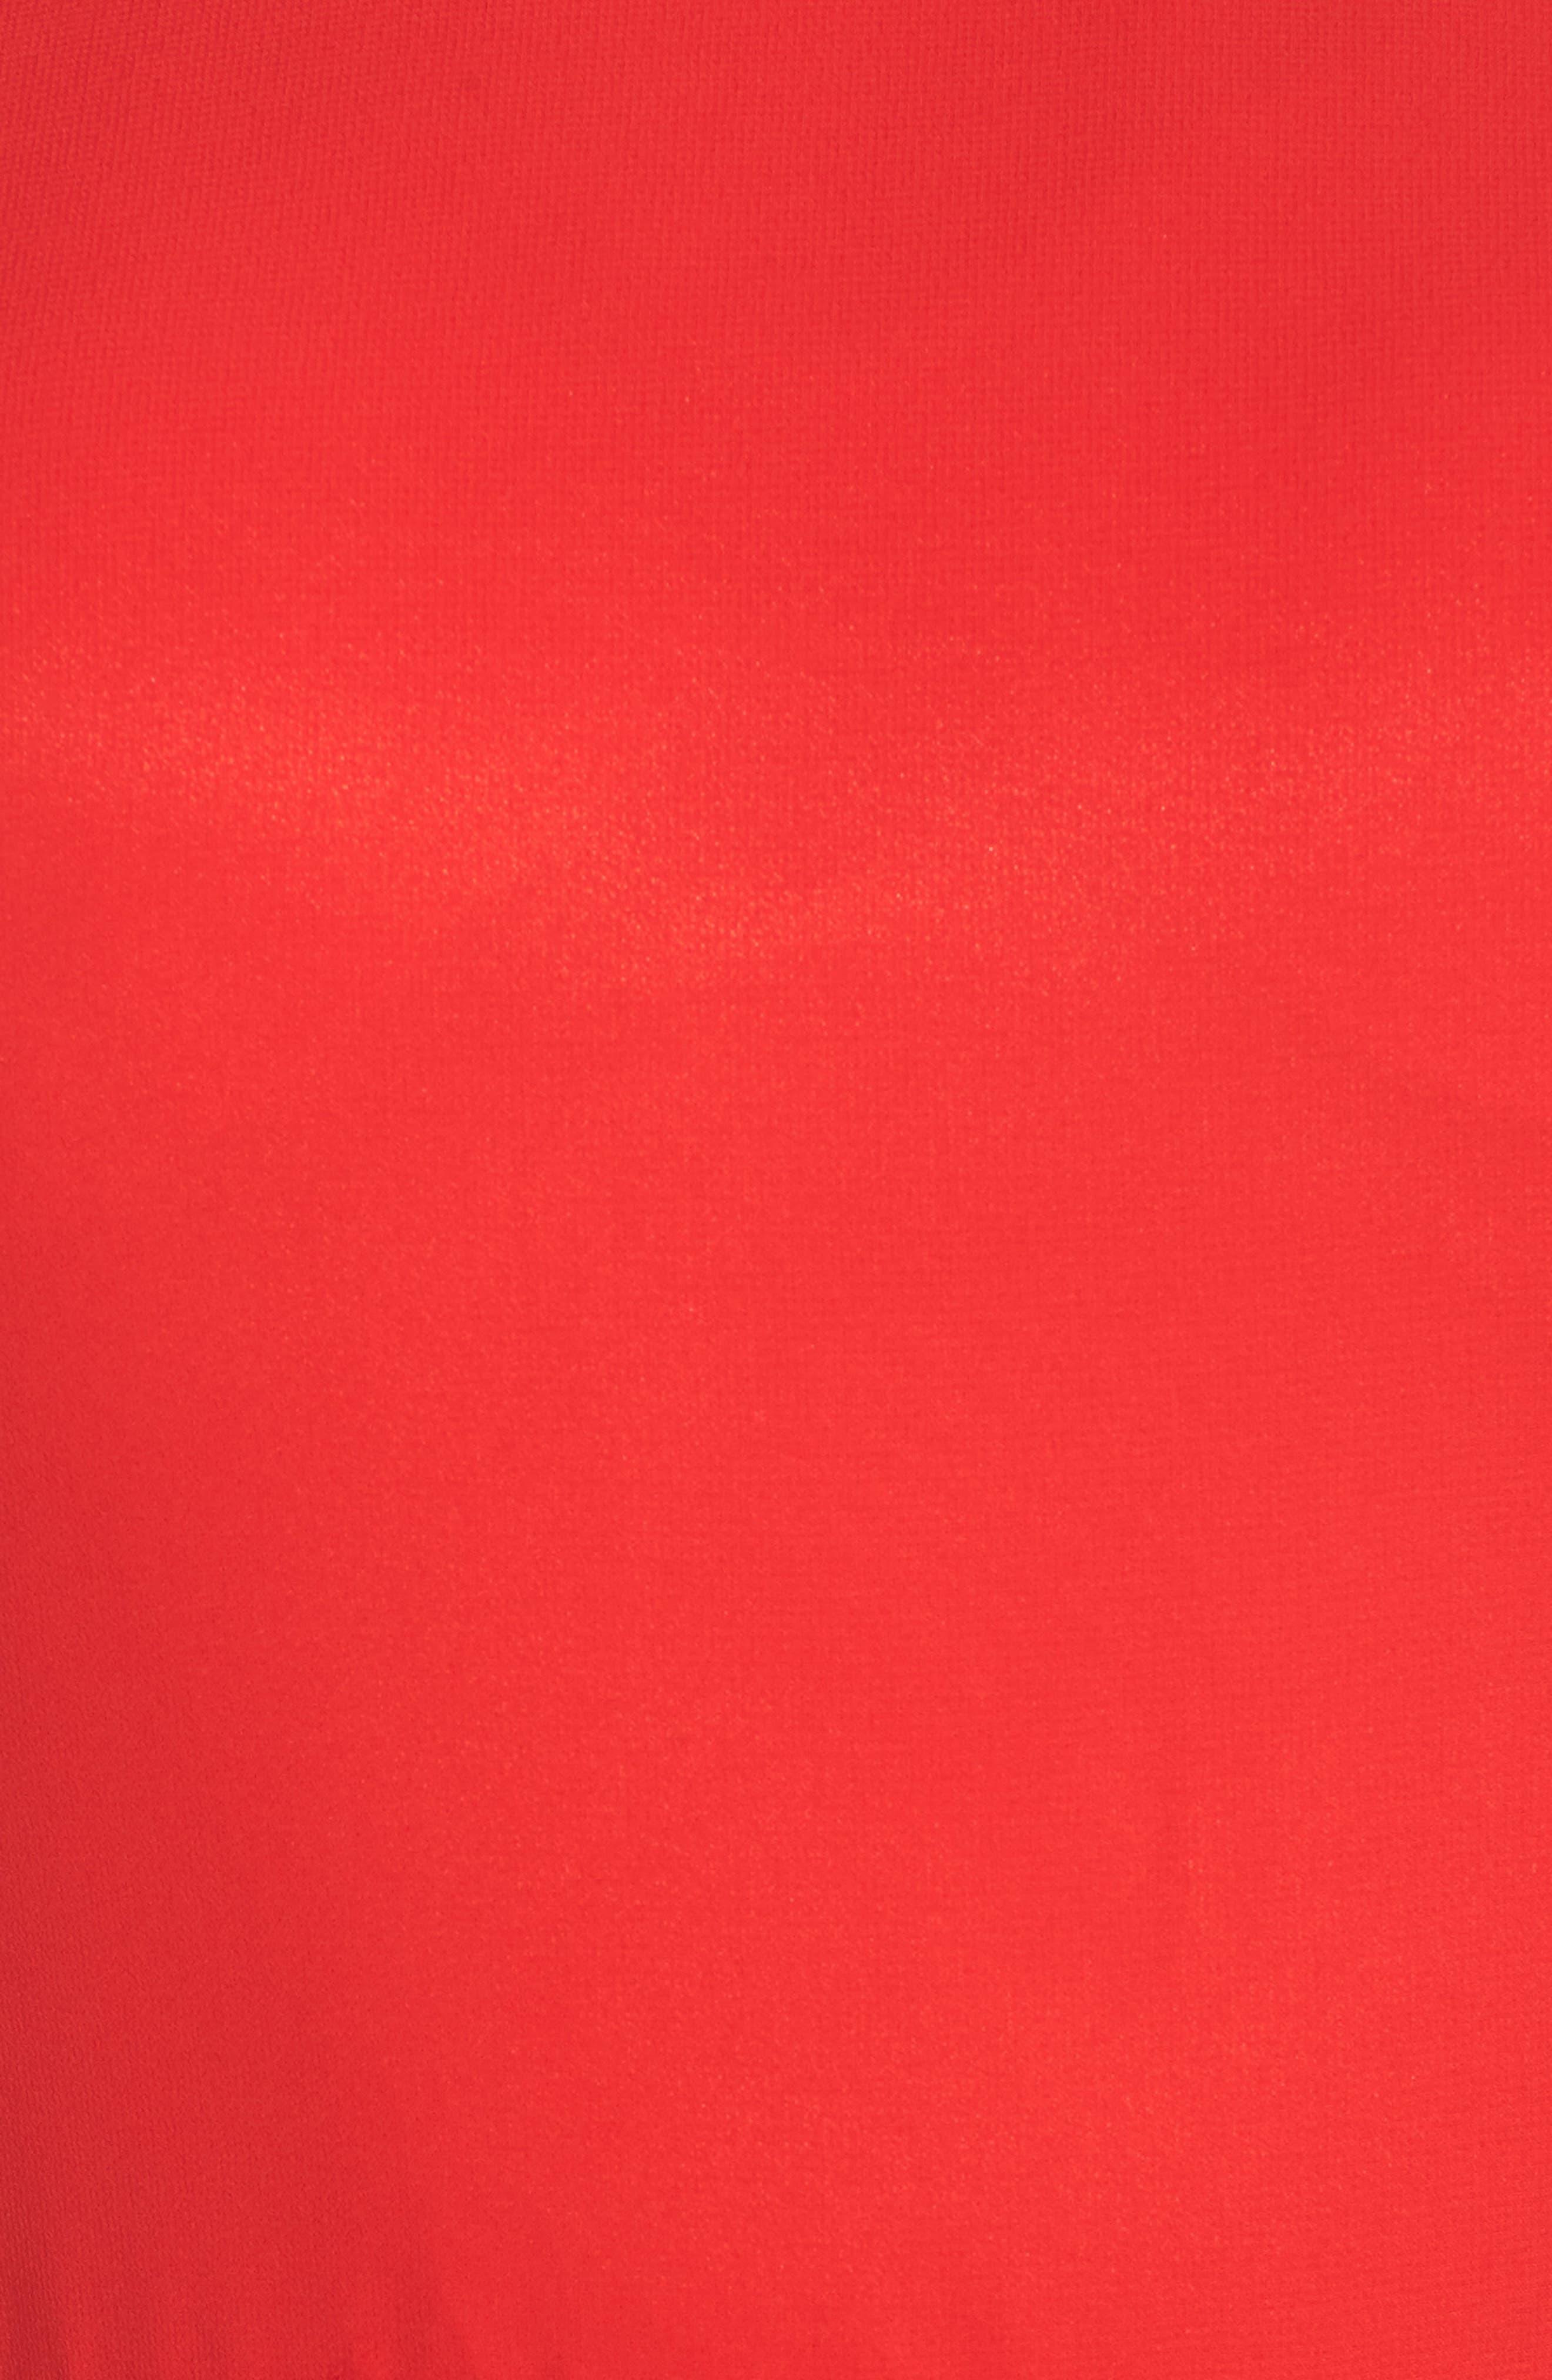 Bateau Neck Ballgown,                             Alternate thumbnail 5, color,                             Red